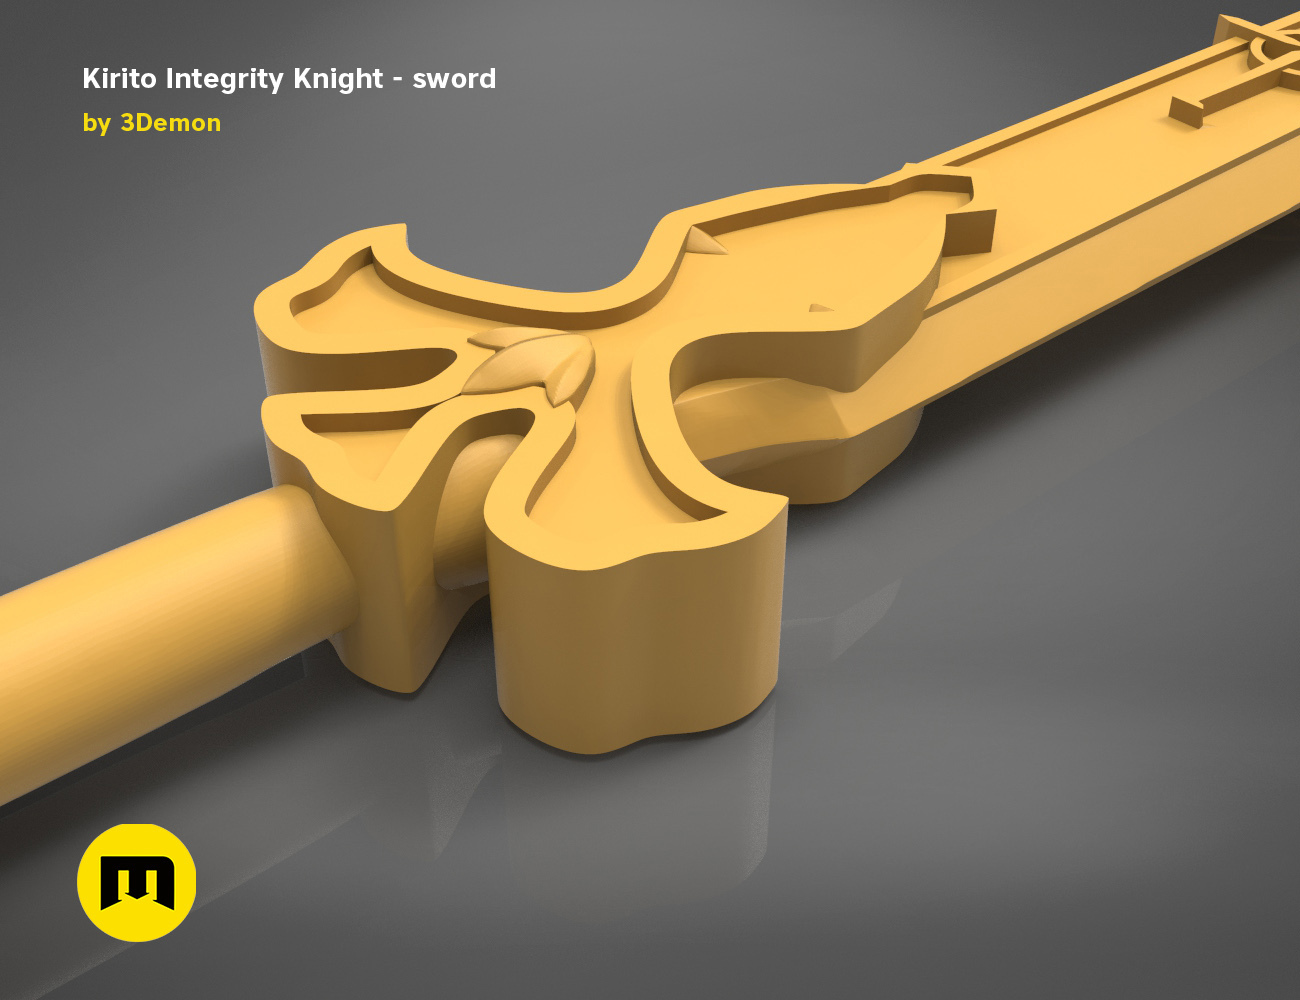 render_scene_Integrity-knight-sword-basic.19 kopie.jpg Download STL file Kirito's Sword - Integrity Knight • 3D print model, 3D-mon